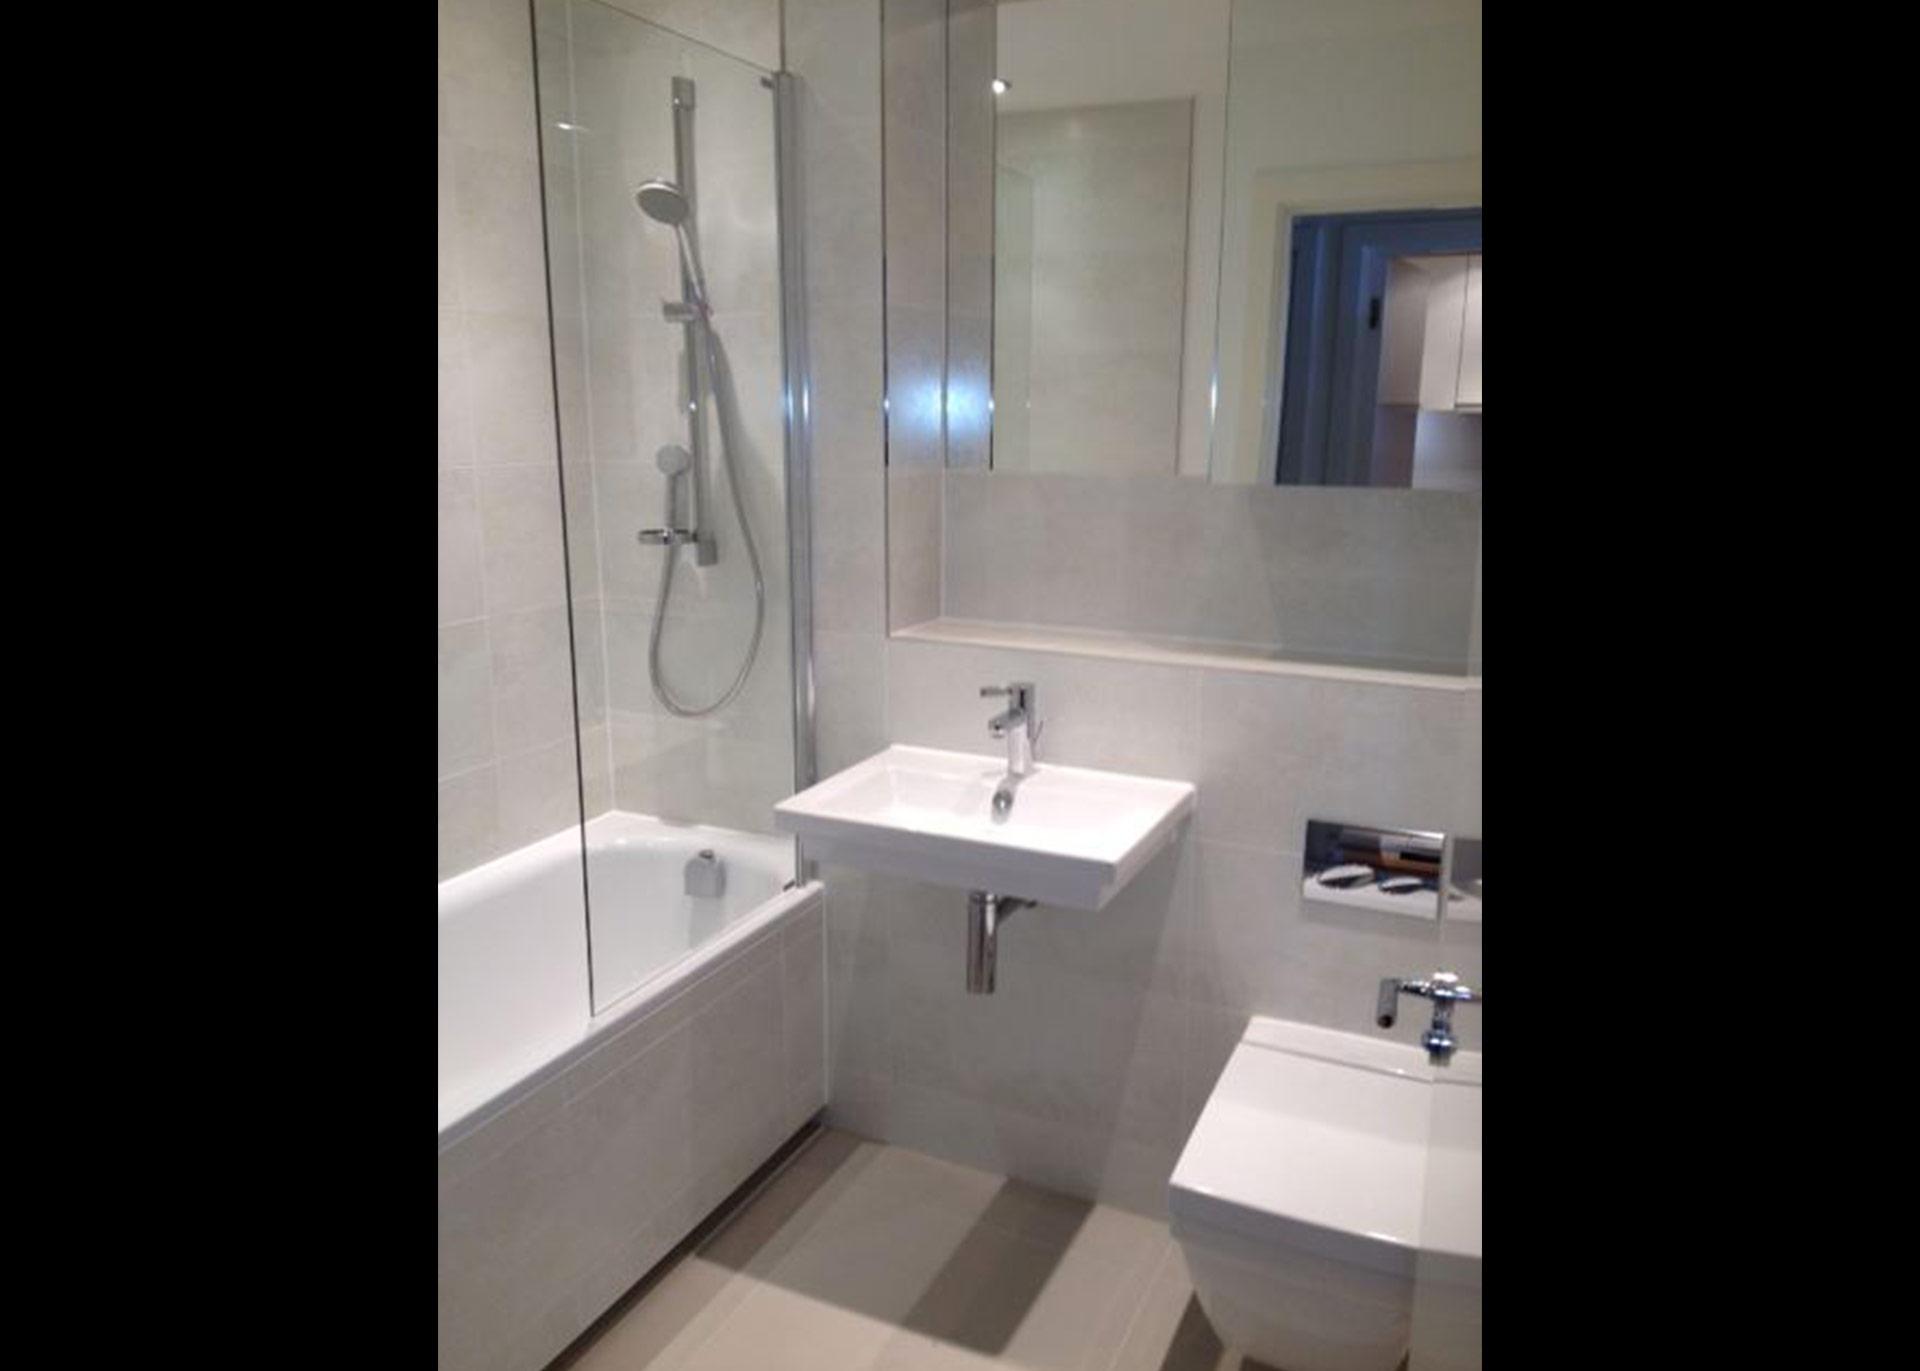 Apartment Bathroom b216